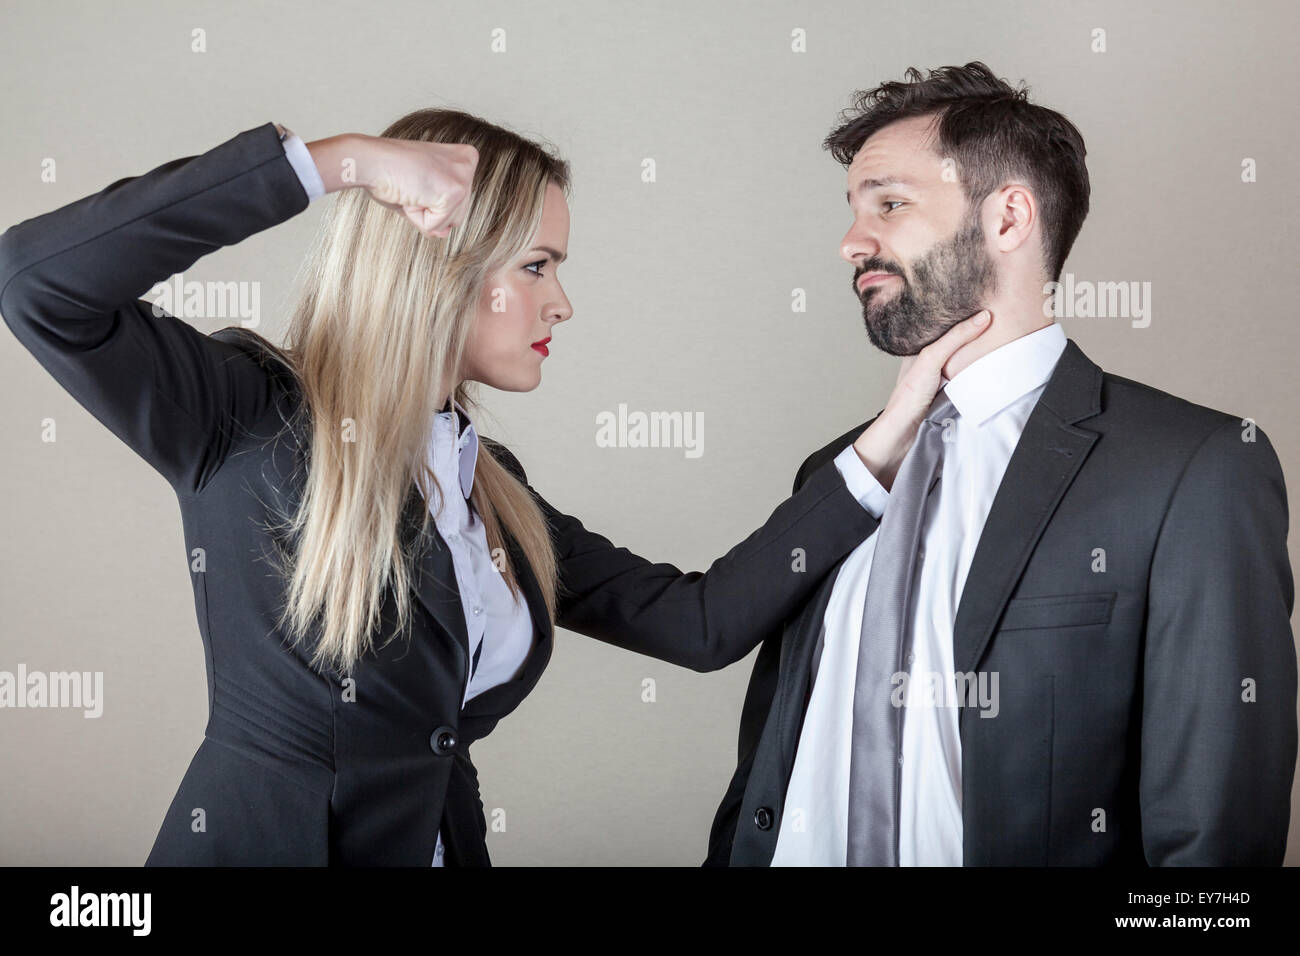 Business-Frau erwürgt einen Business-Mann Stockfoto